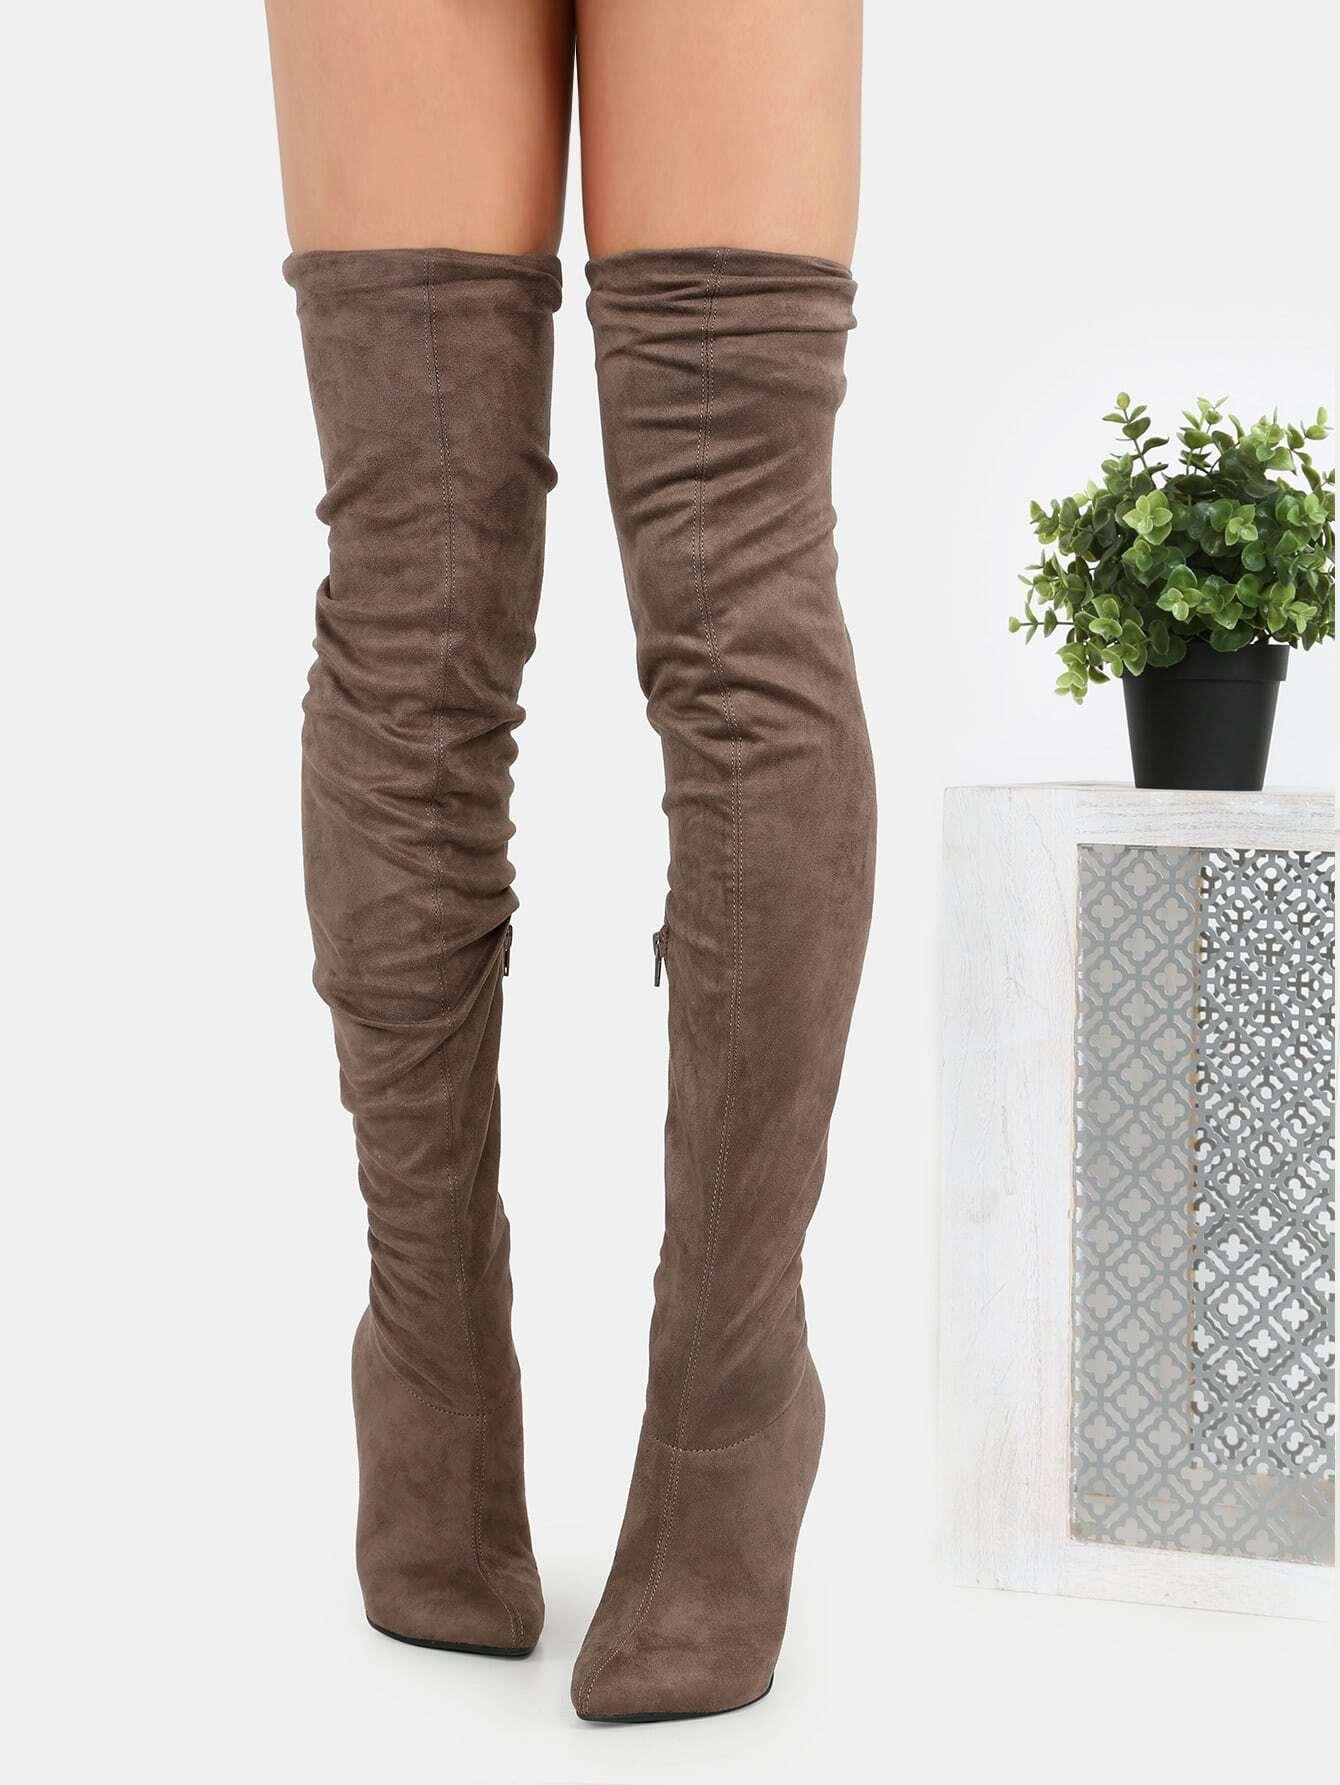 Slouchy Stiletto Thigh High Boots TAUPE -SheIn(Sheinside)